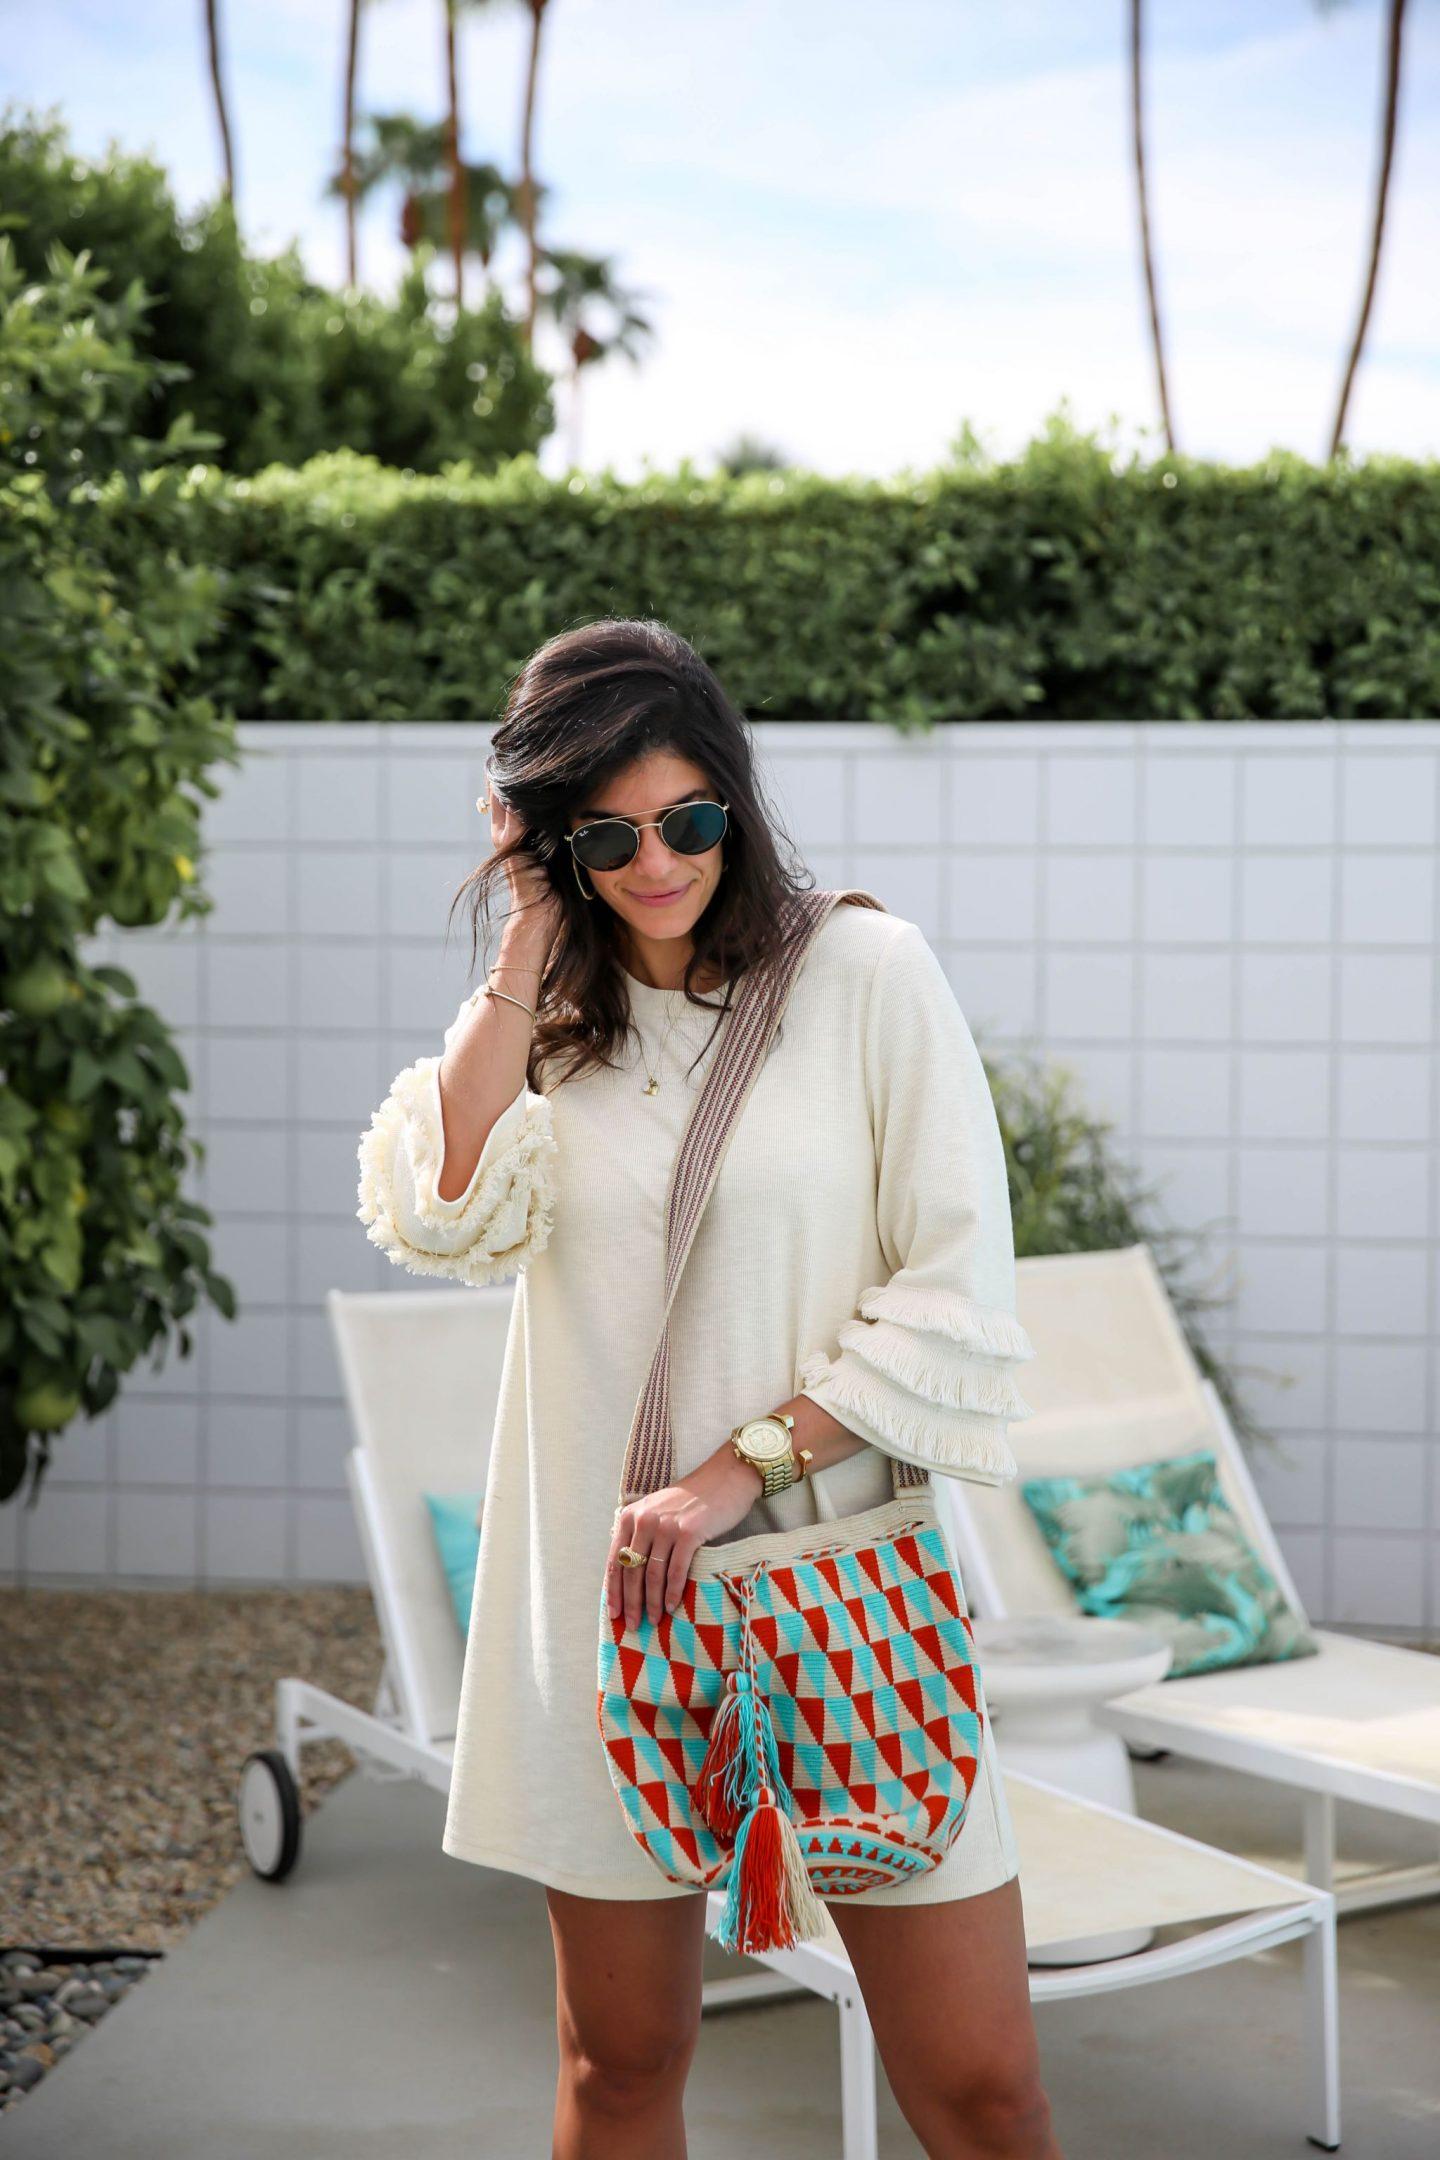 MãeAzul Boho Bag - Lauren Schwaiger Style Blog